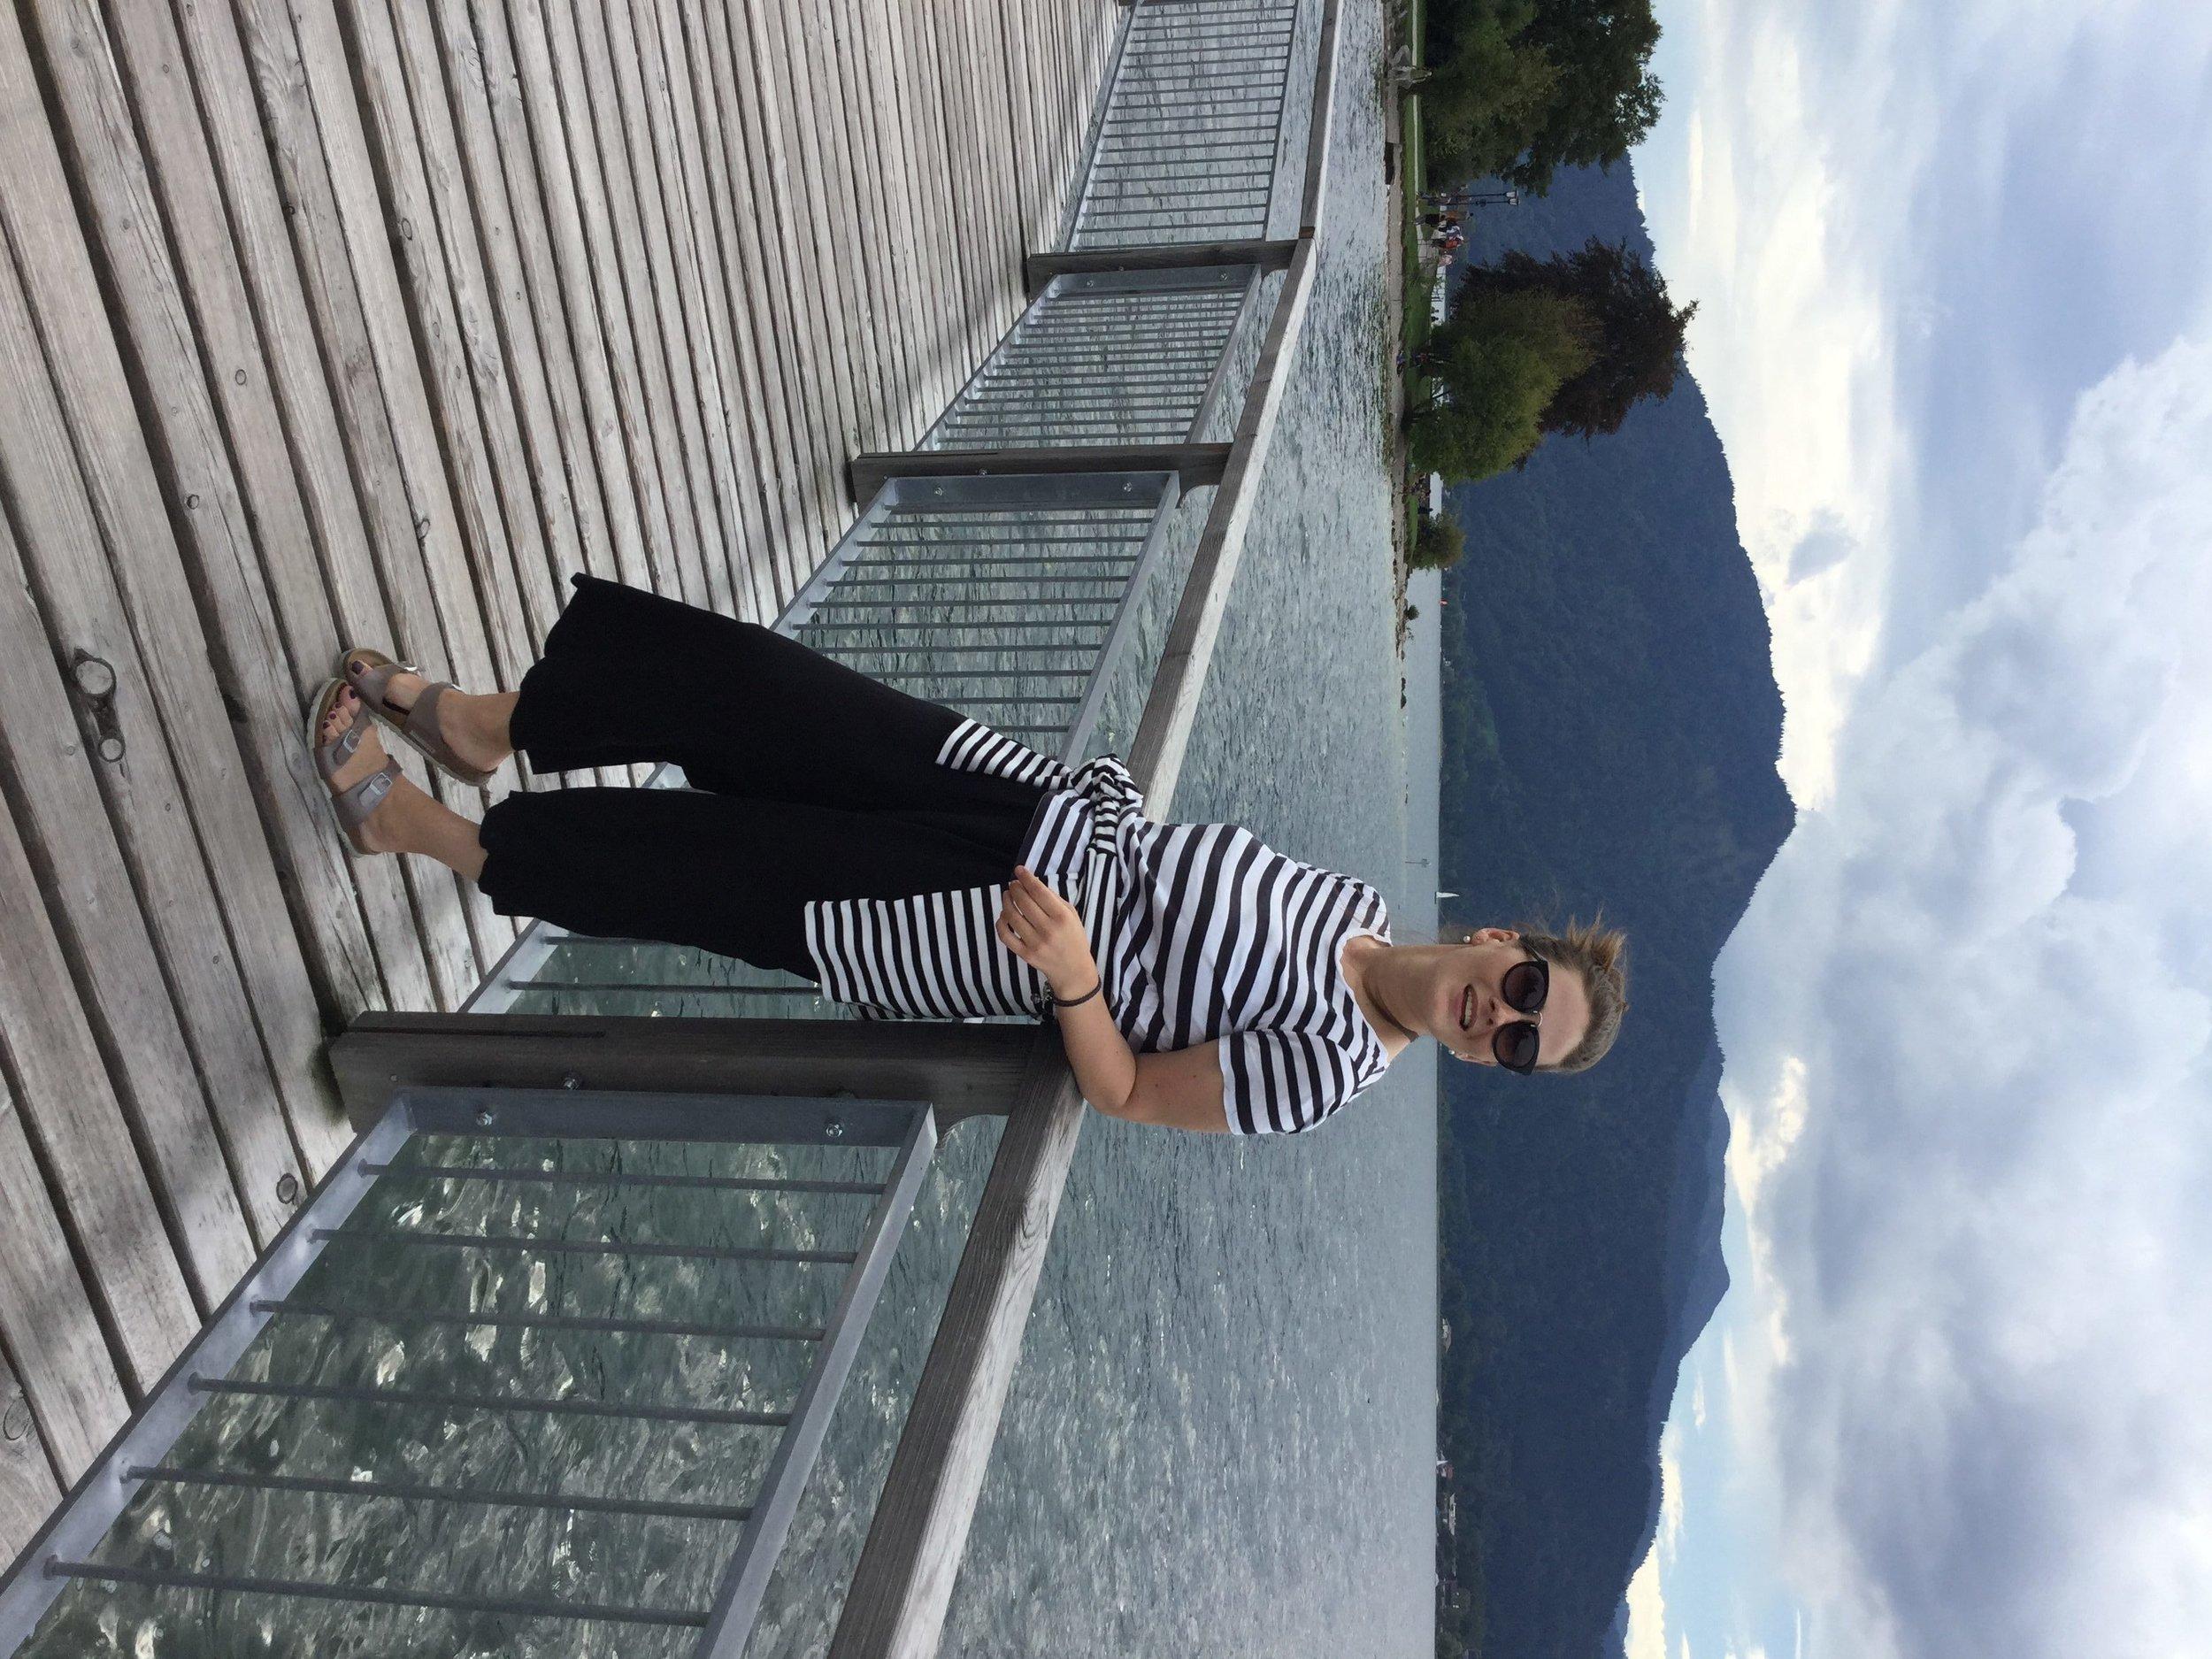 tegernsee-travel-lake-germany-bavaria-annaporter